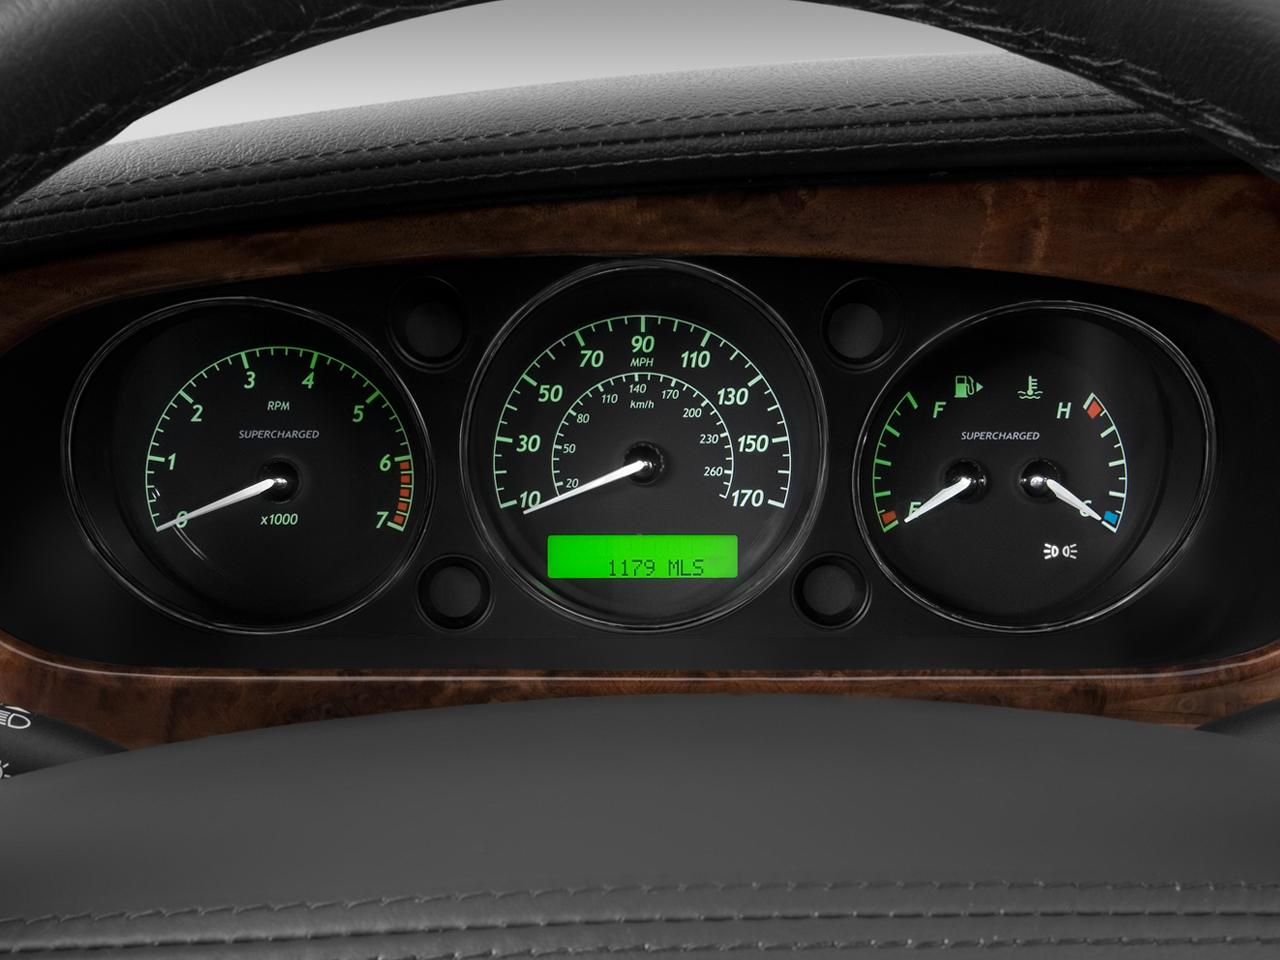 2008 Jaguar XJ Vanden Plas  Jaguar Luxury Sedan Review